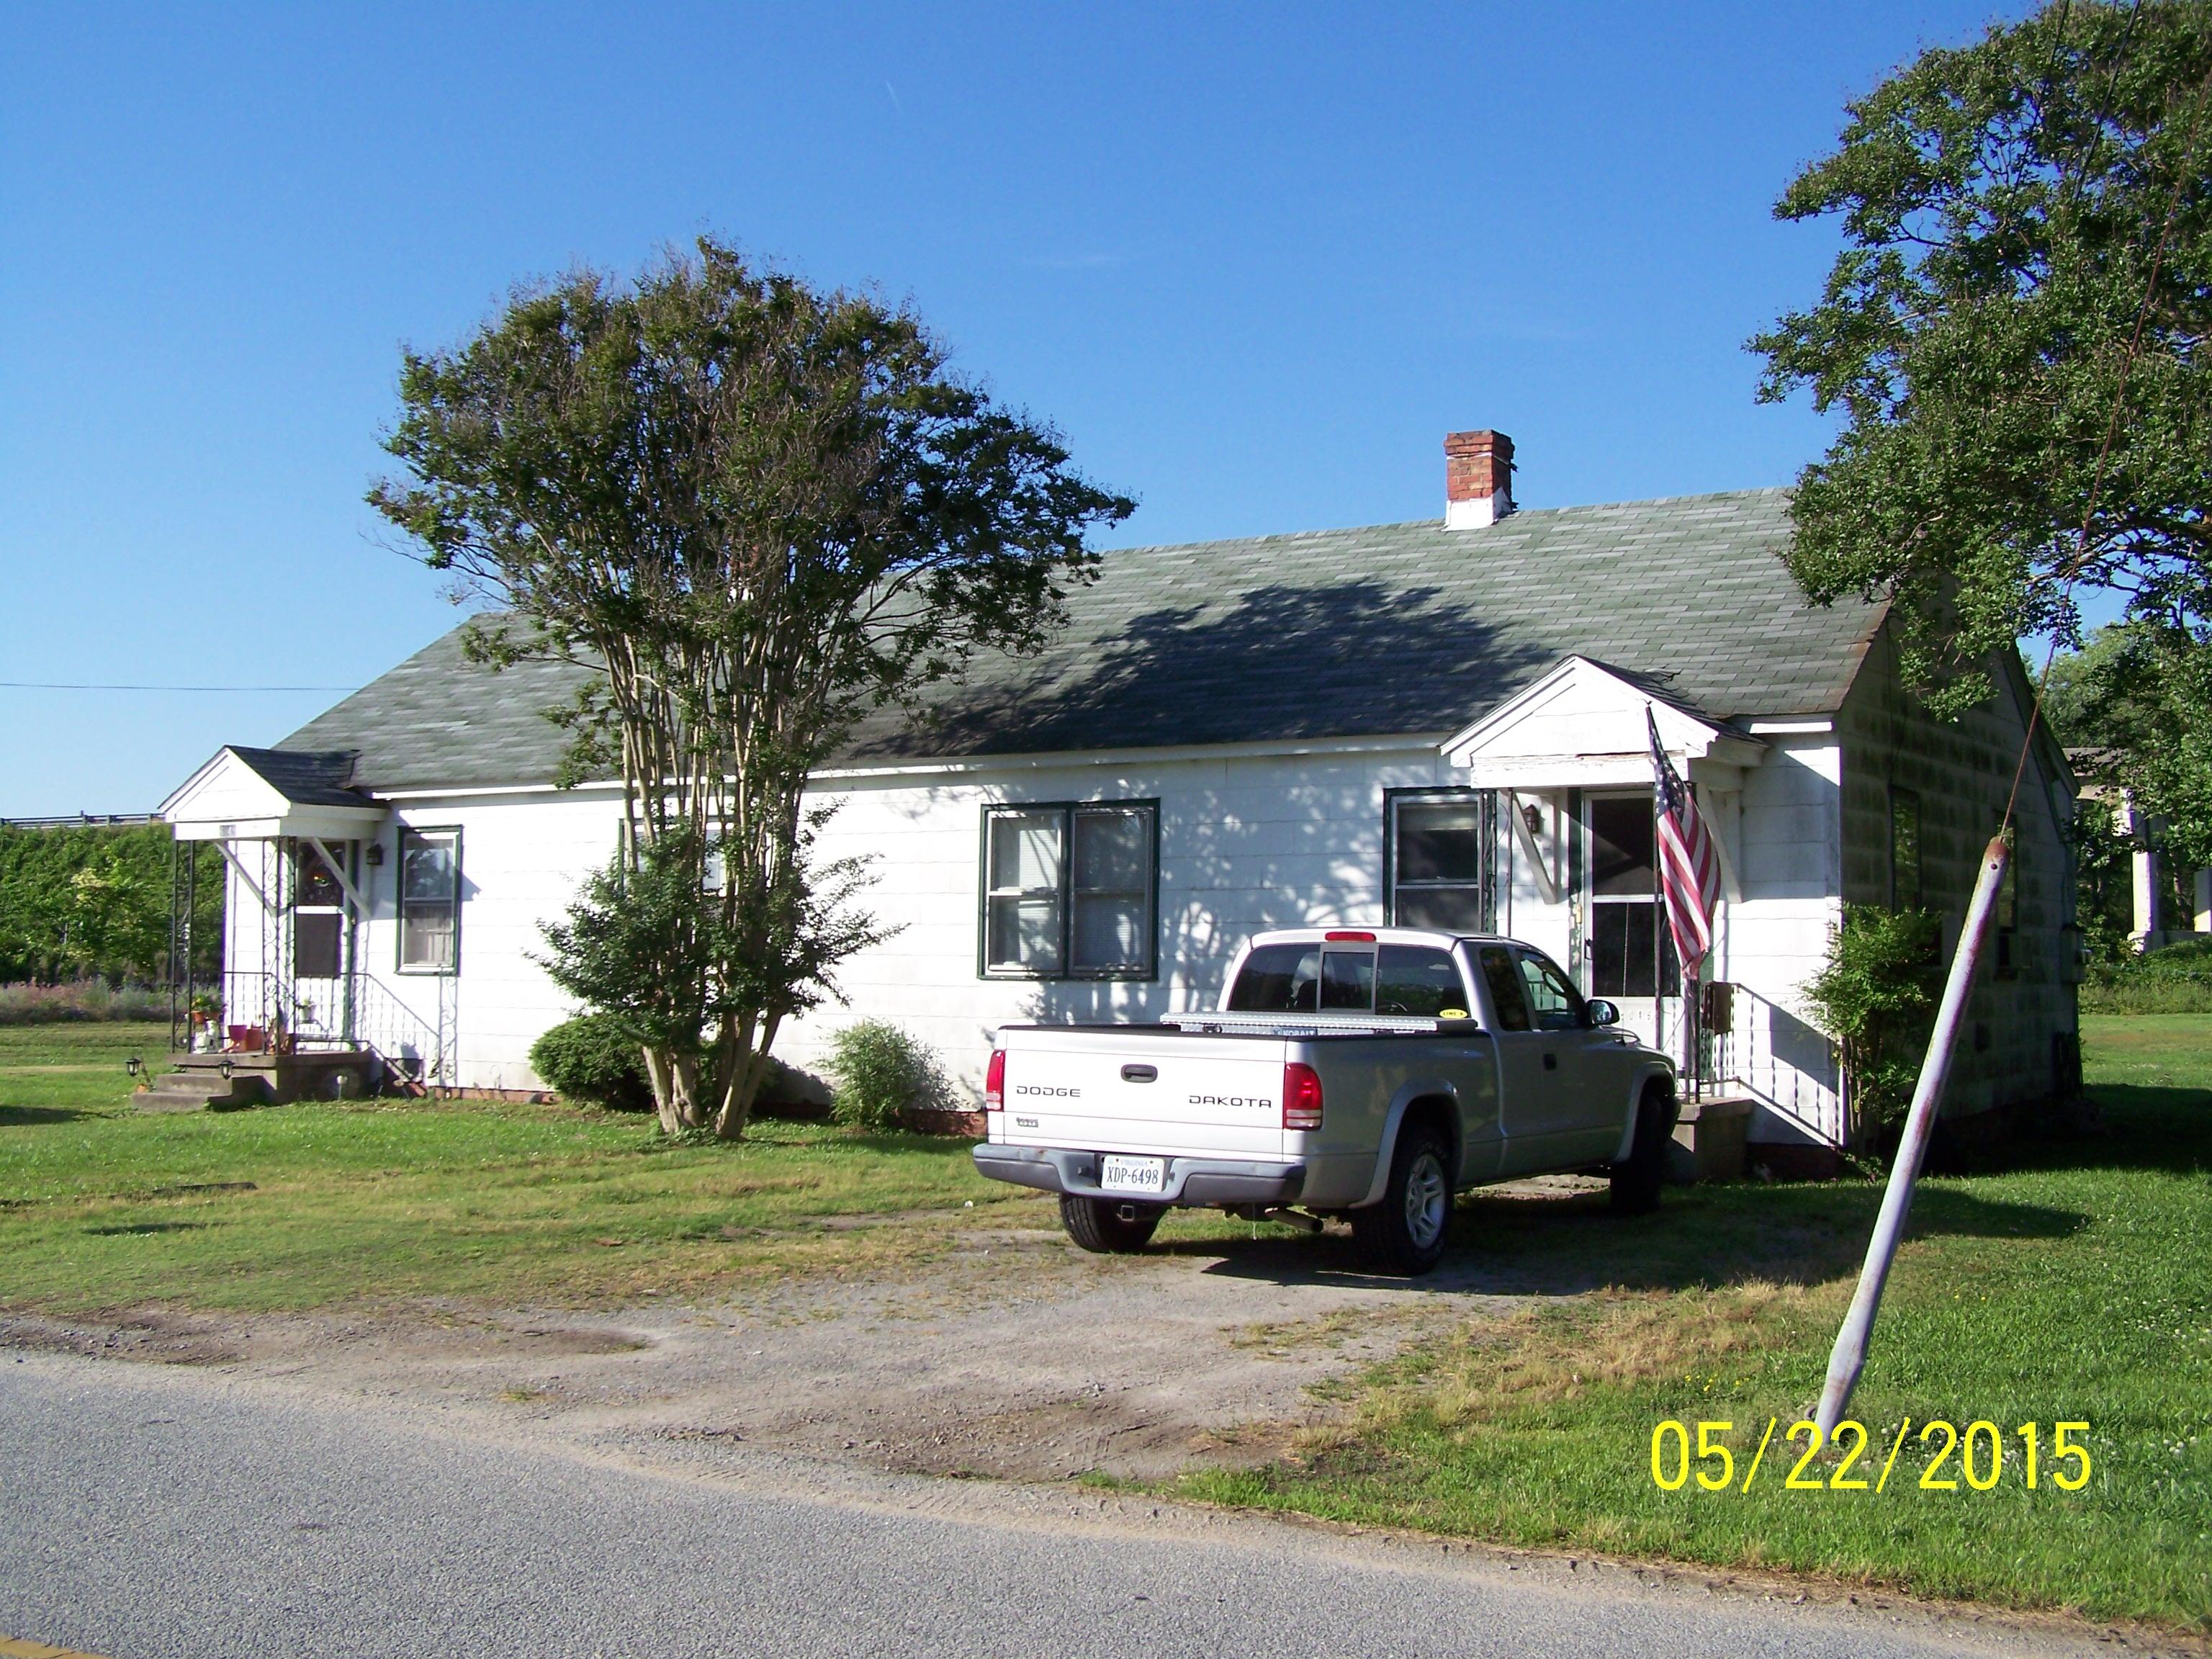 6049 Old Carrsville Road, Carrsville, VA 23315